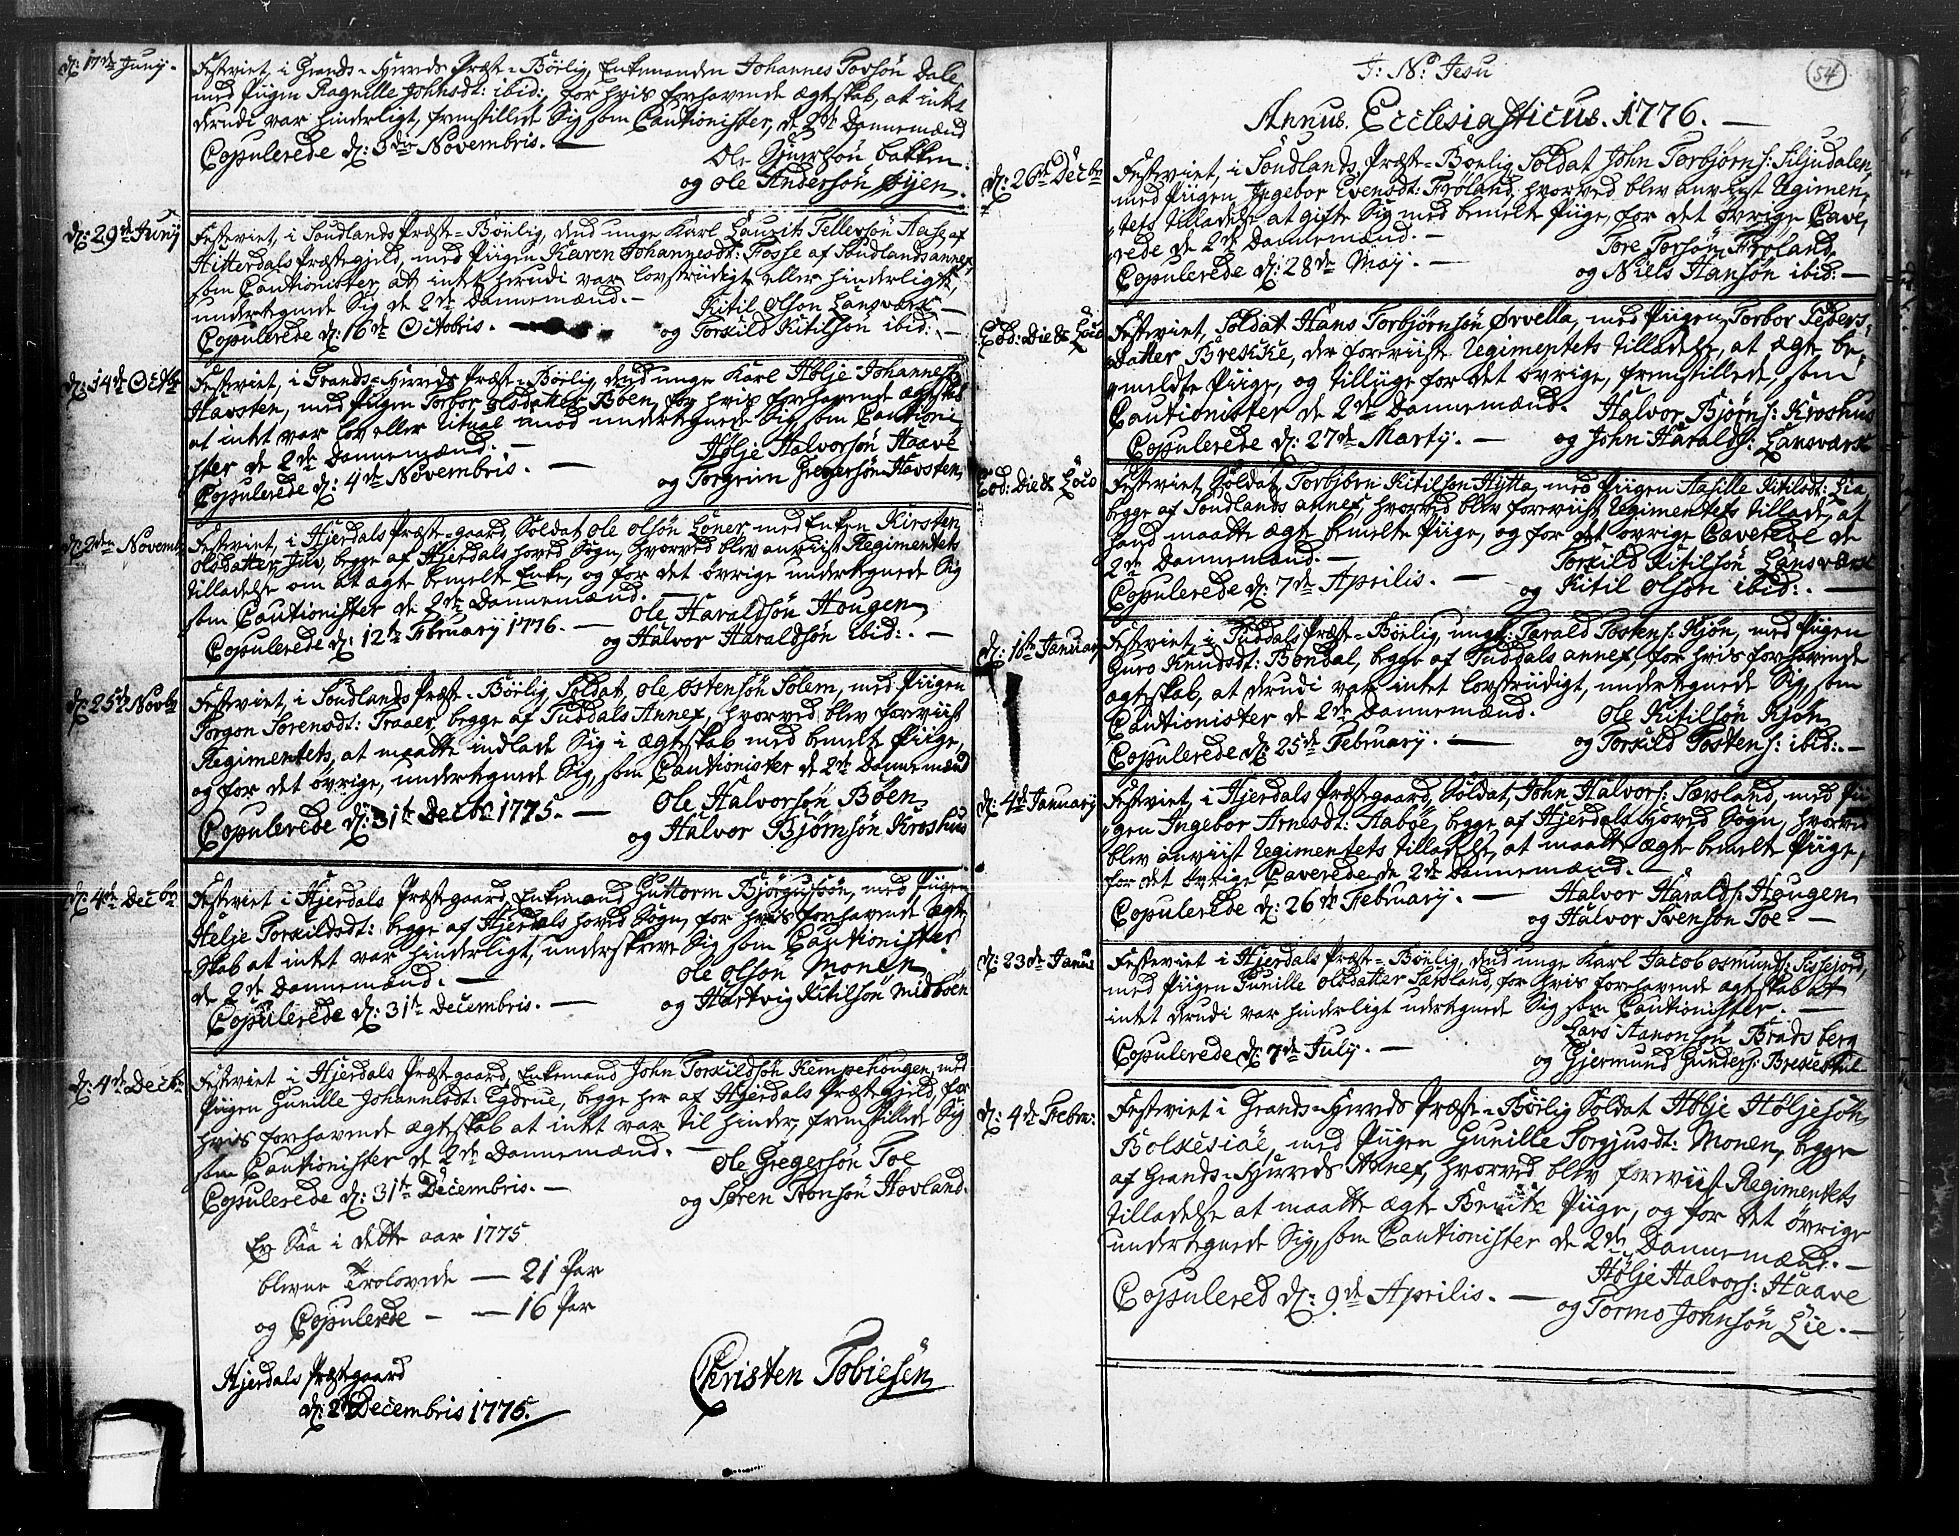 SAKO, Hjartdal kirkebøker, F/Fa/L0004: Ministerialbok nr. I 4, 1727-1795, s. 54